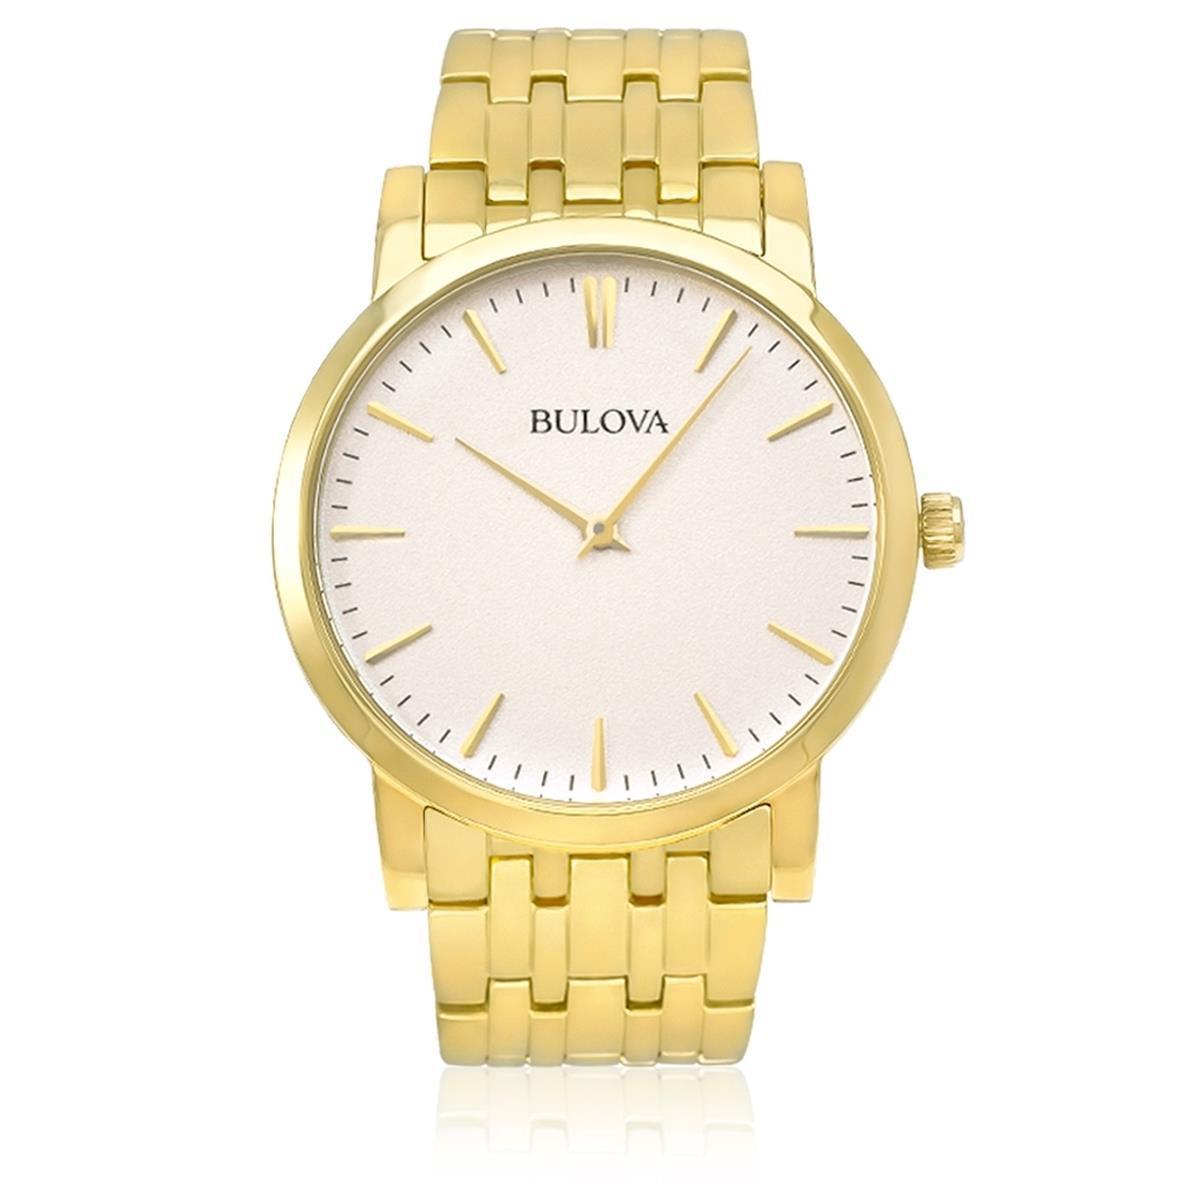 8460f78c846 Relógio Masculino Bulova Analógico WB21669H Aço Dourado R  780